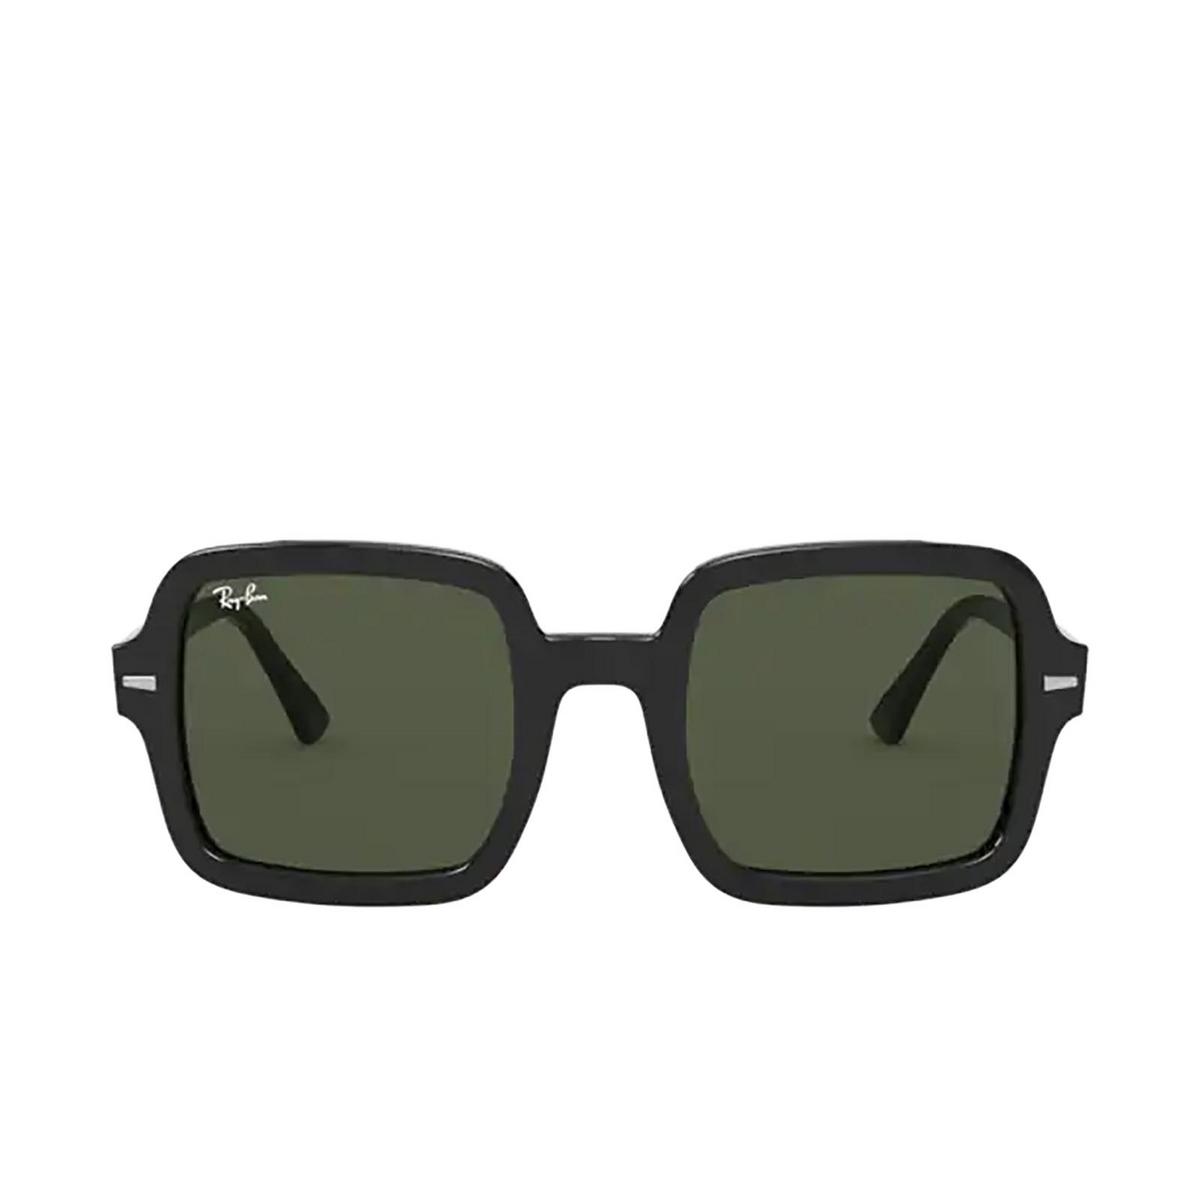 Ray-Ban® Square Sunglasses: RB2188 color Black 901/31 - 1/3.